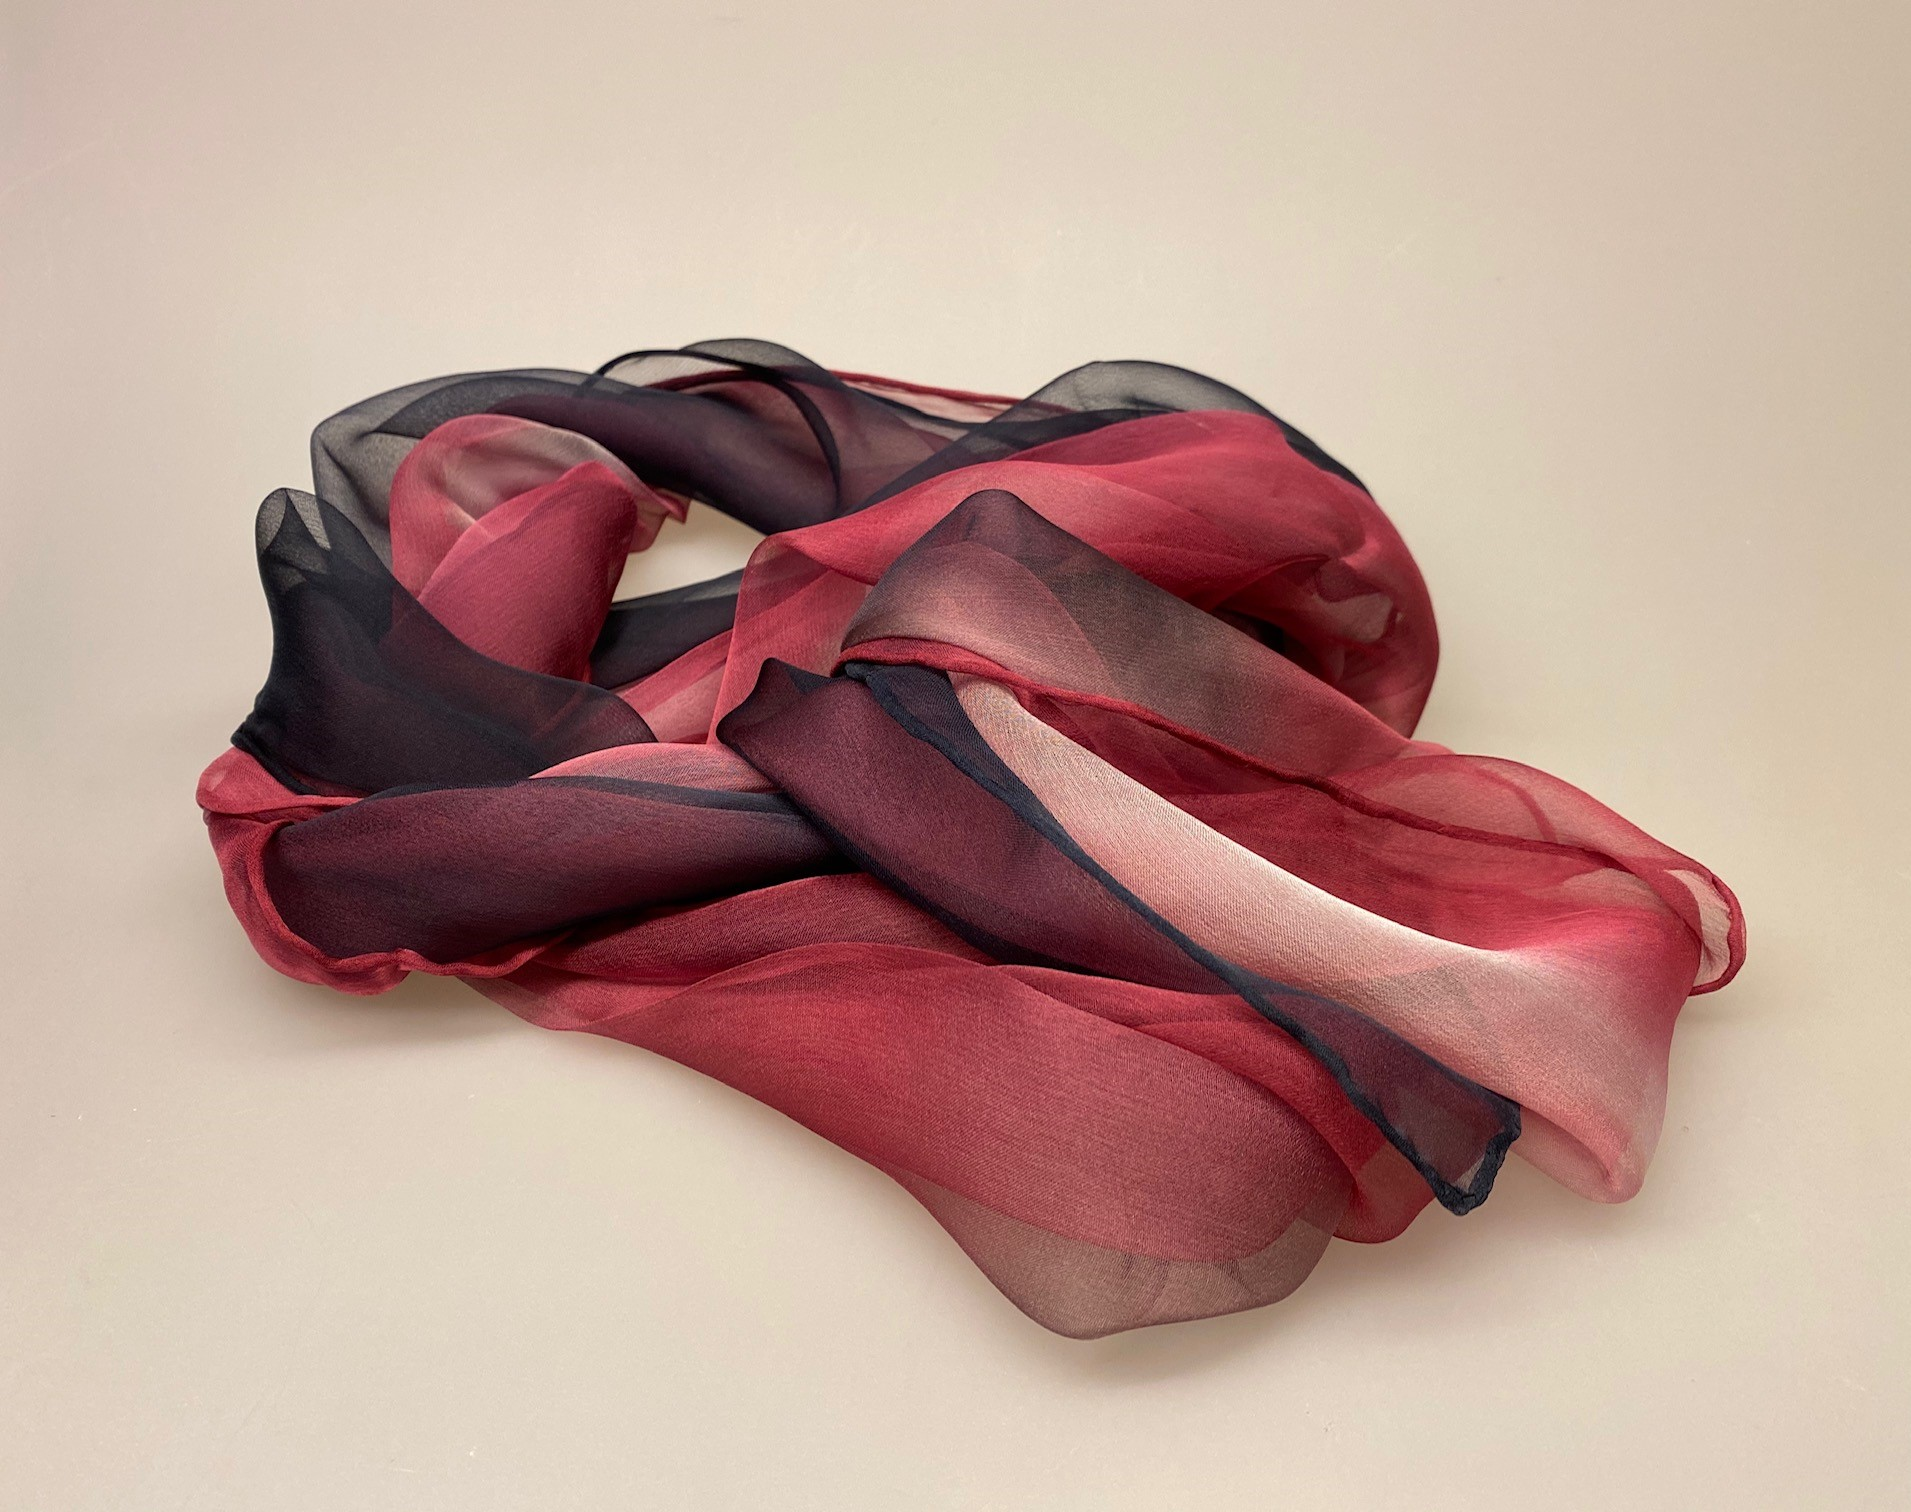 Silkechiffon Tørklæde 1158 - Marineblå/lyng/rosa , 1158-249, marineblå, navy, mørkeblå, lyngfarvet, lilla, lynglilla, rosa, silke, ren silke, silketørklæde, silkechiffon, let, stort, volumen, sjal, stola, fest, festtøj, elegant, kvalitet, flot, kor, gave, gaveide, rund fødselsdag, biti, ribe